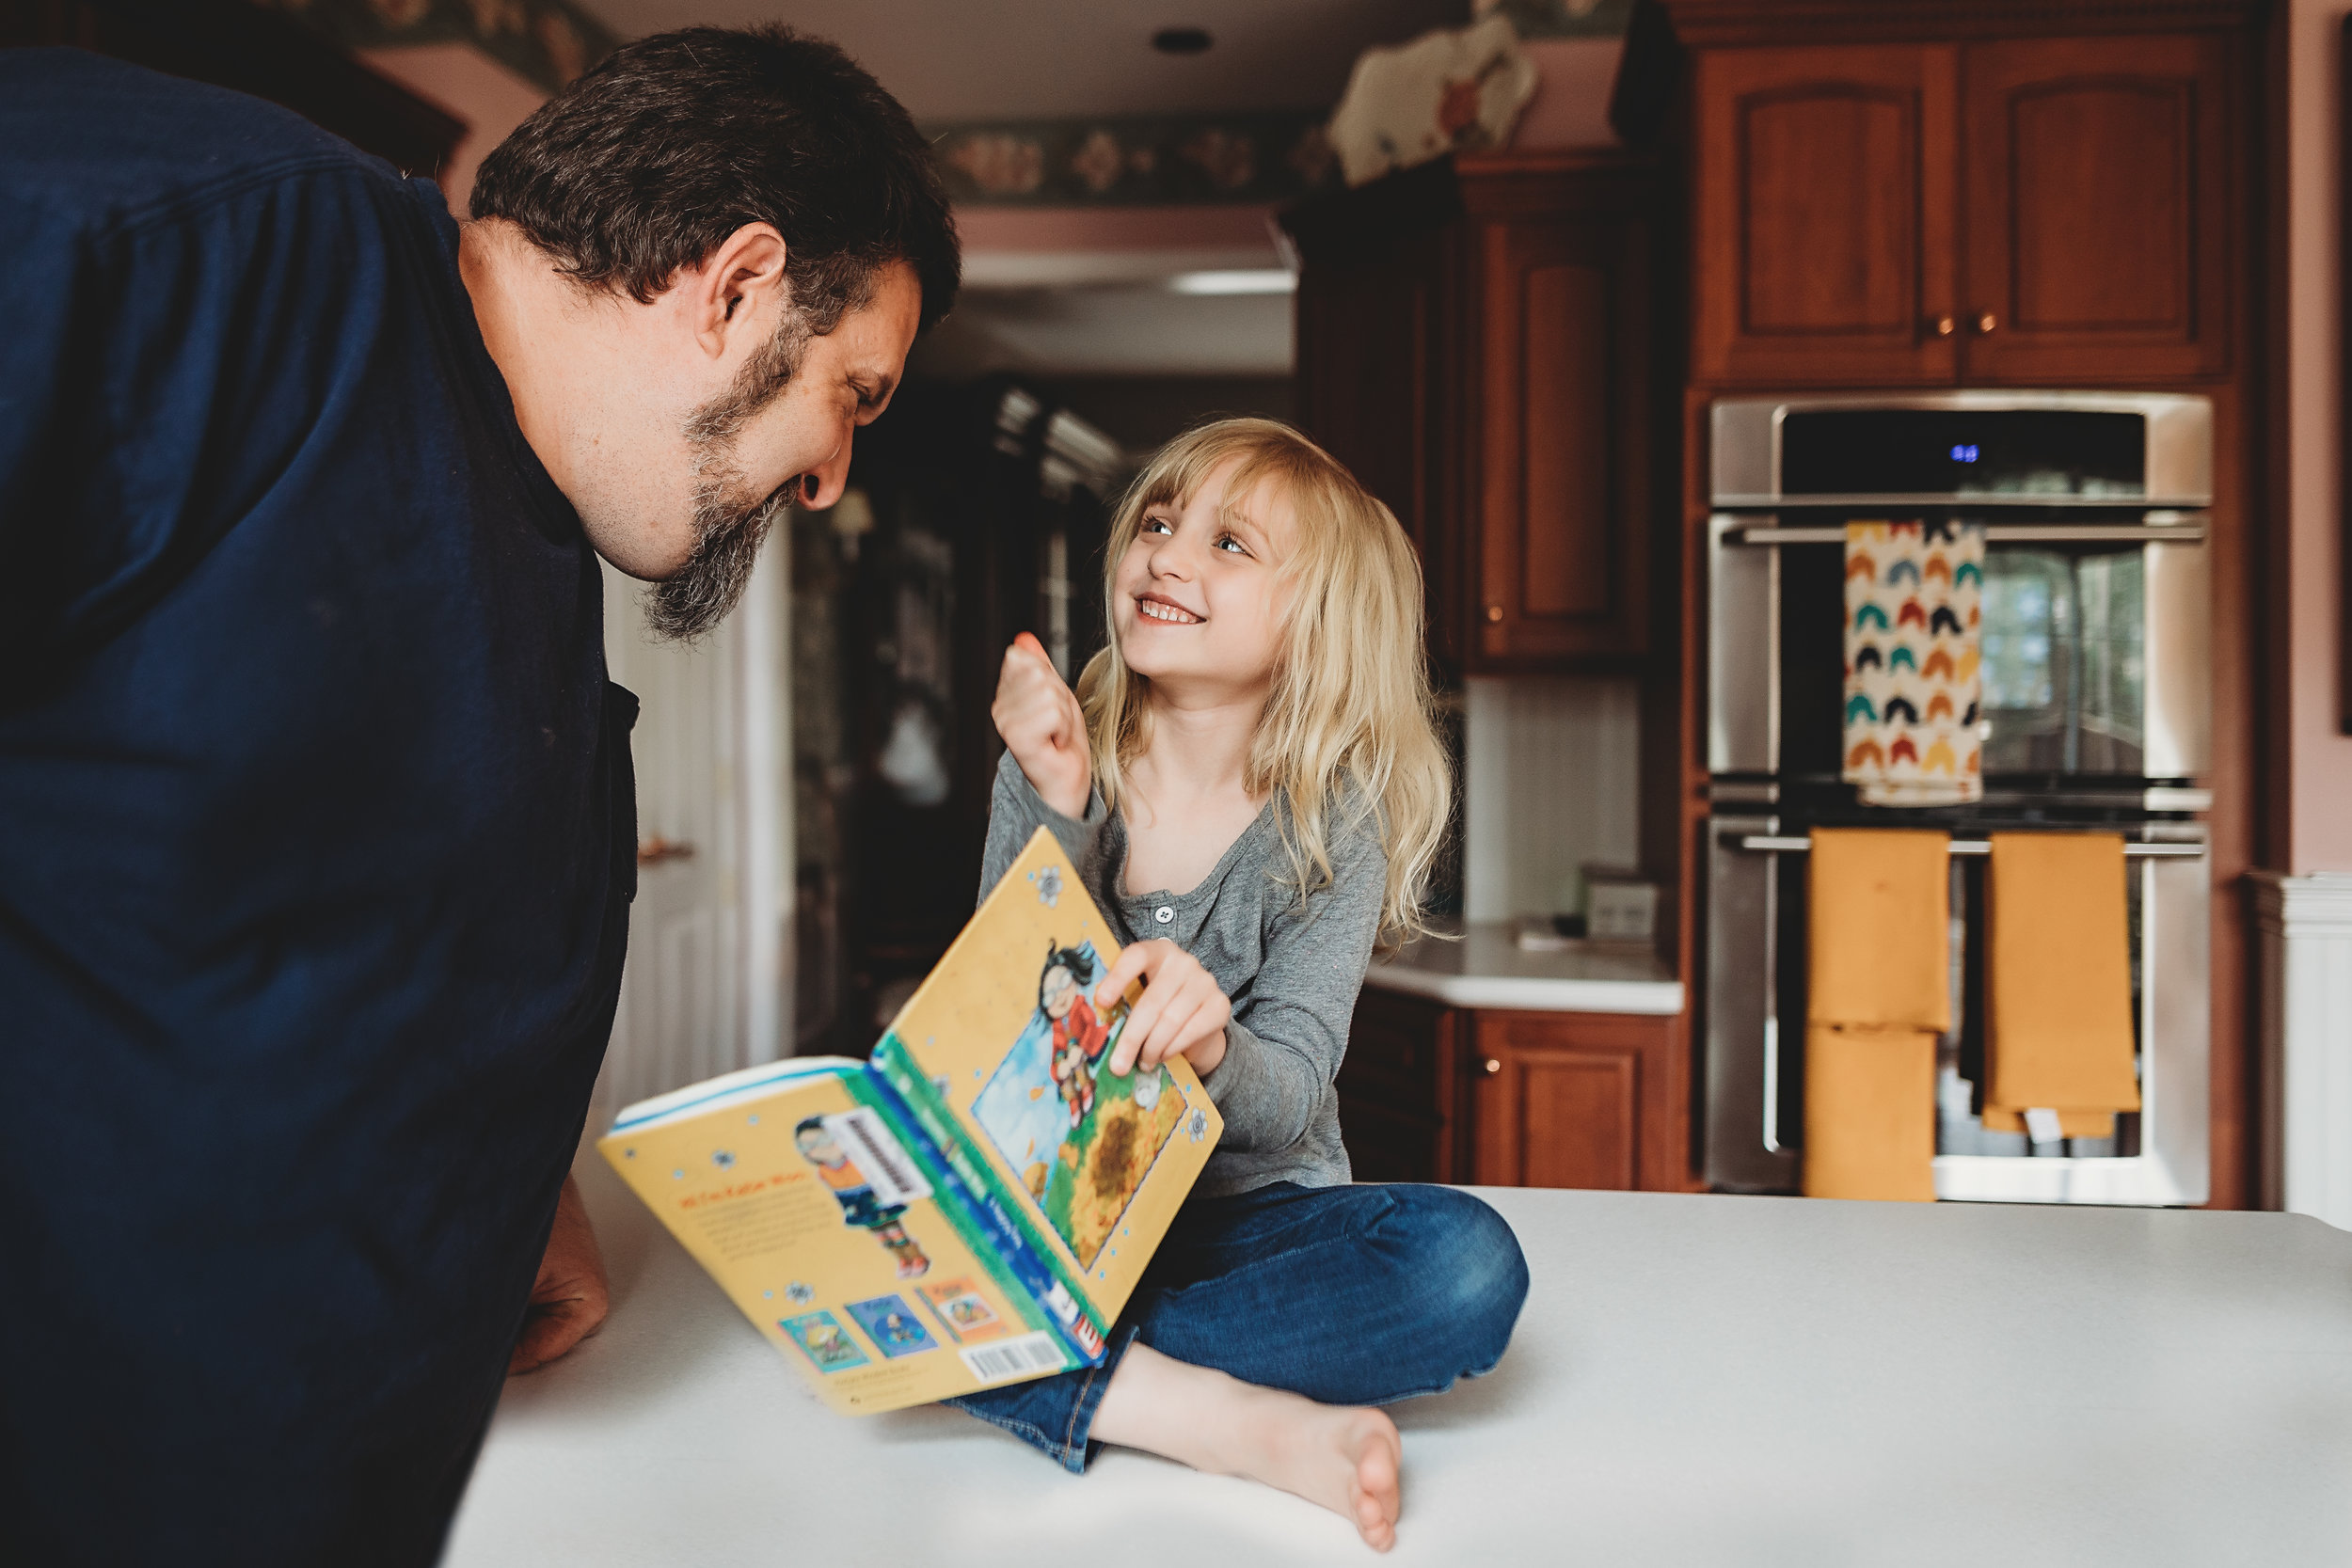 Hello-olivia-photography-long-island-photographer-children-lifestyle-dad-book-kitchen